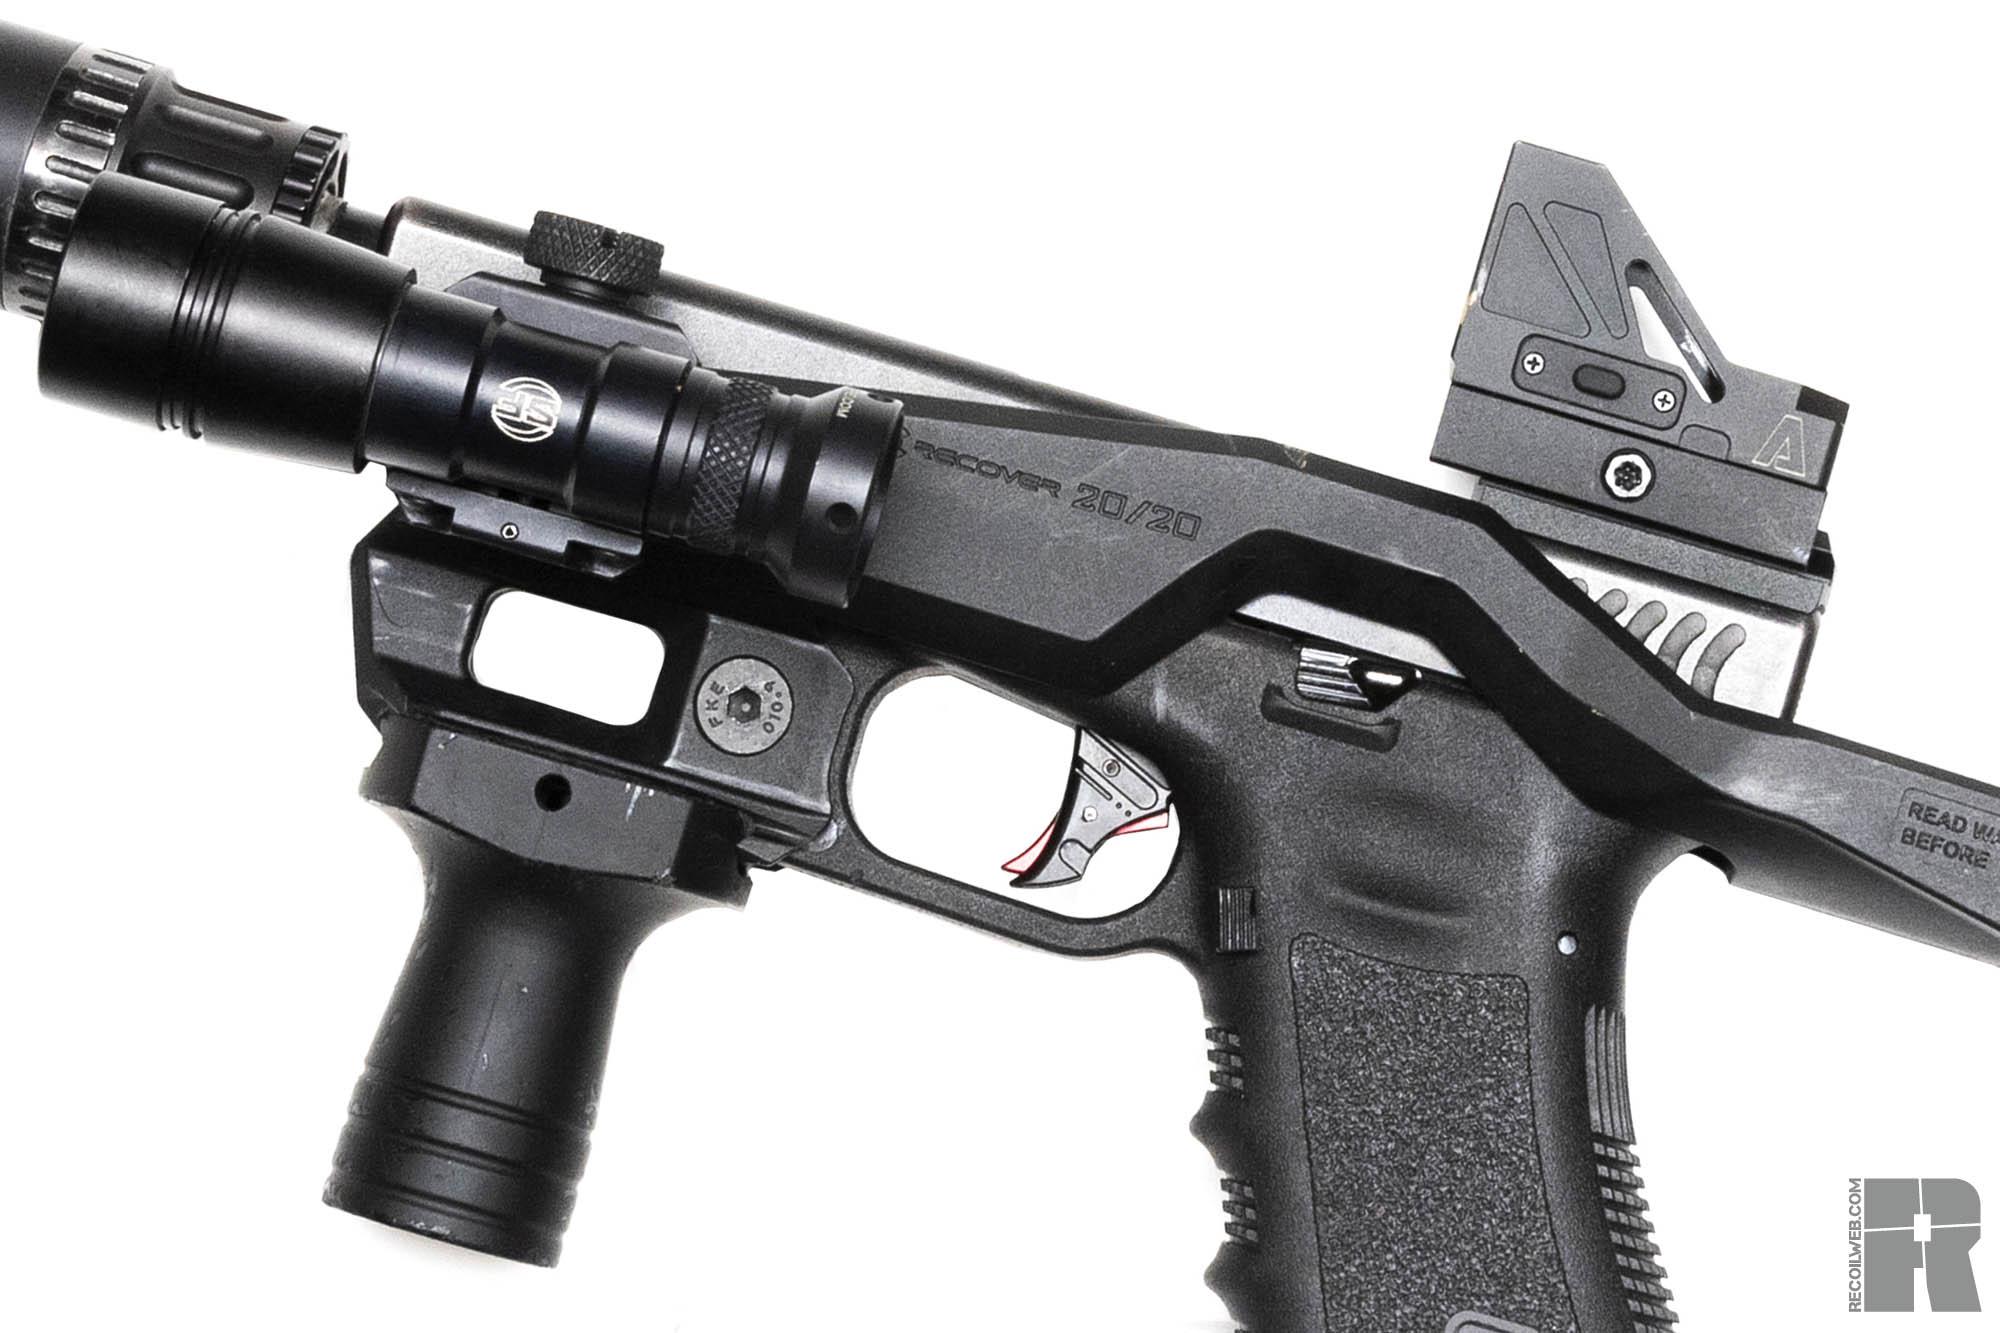 recover tactical 20/20 glock close up